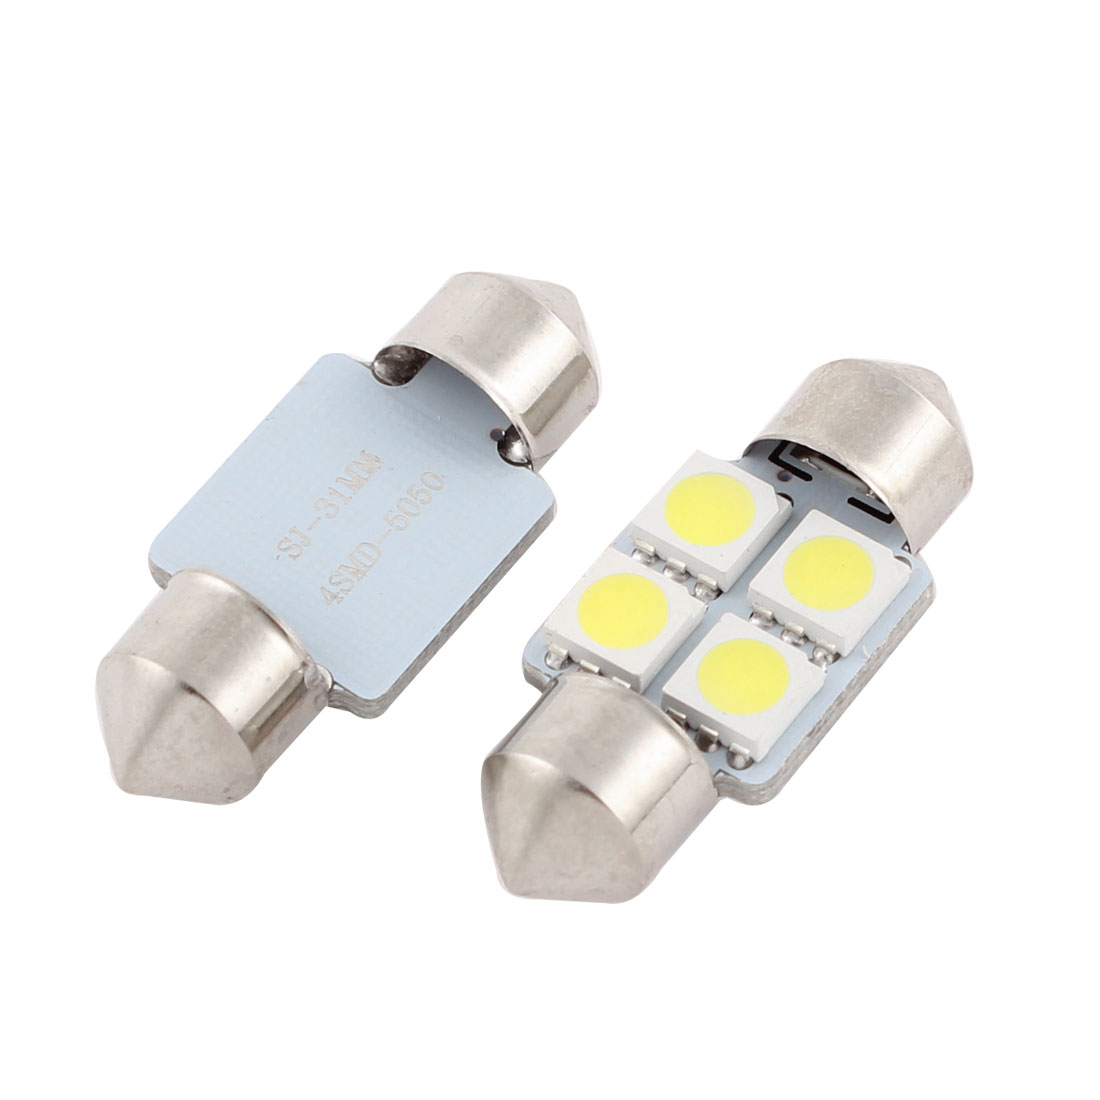 "2 Pcs White 4 LED 5050 SMD 31mm 1.25"" Festoon Dome Light 3175 DE3021 Internal"